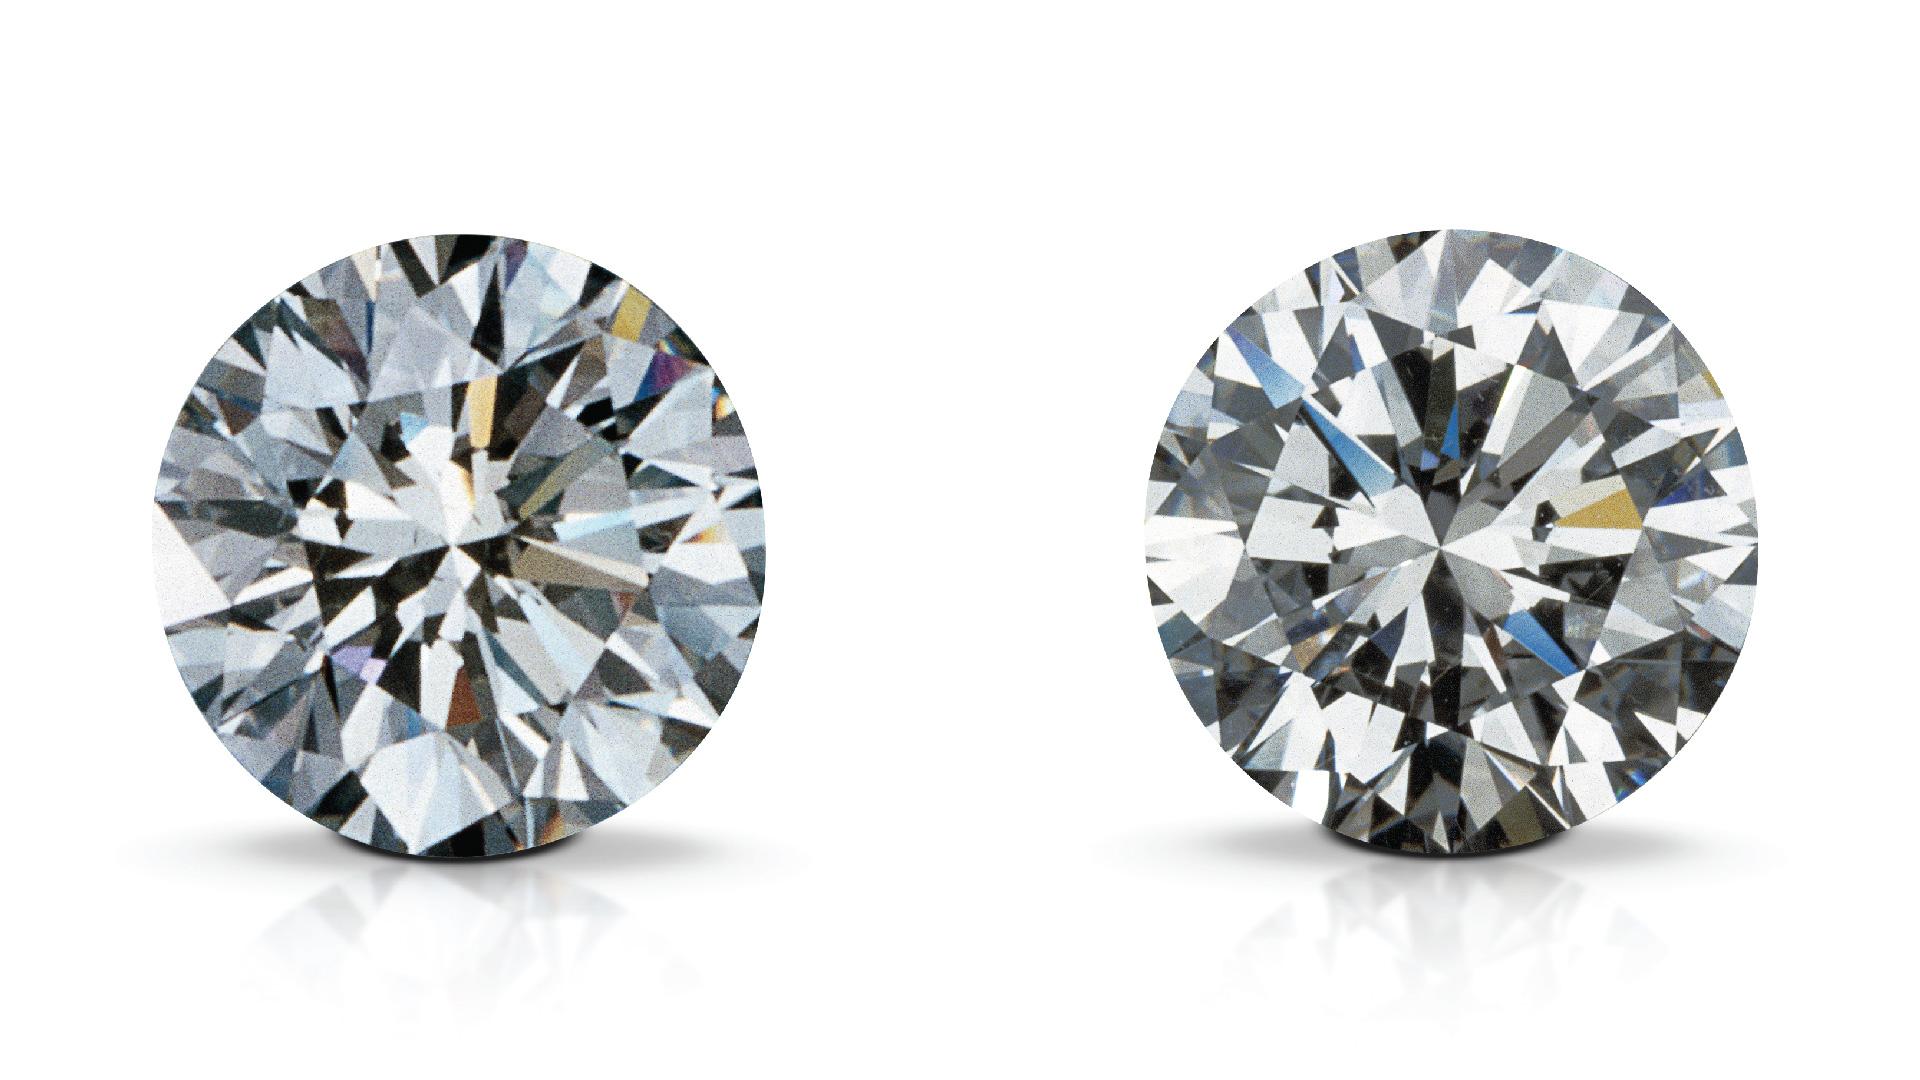 Synthetic Diamond And Natural Diamond Gia 4cs